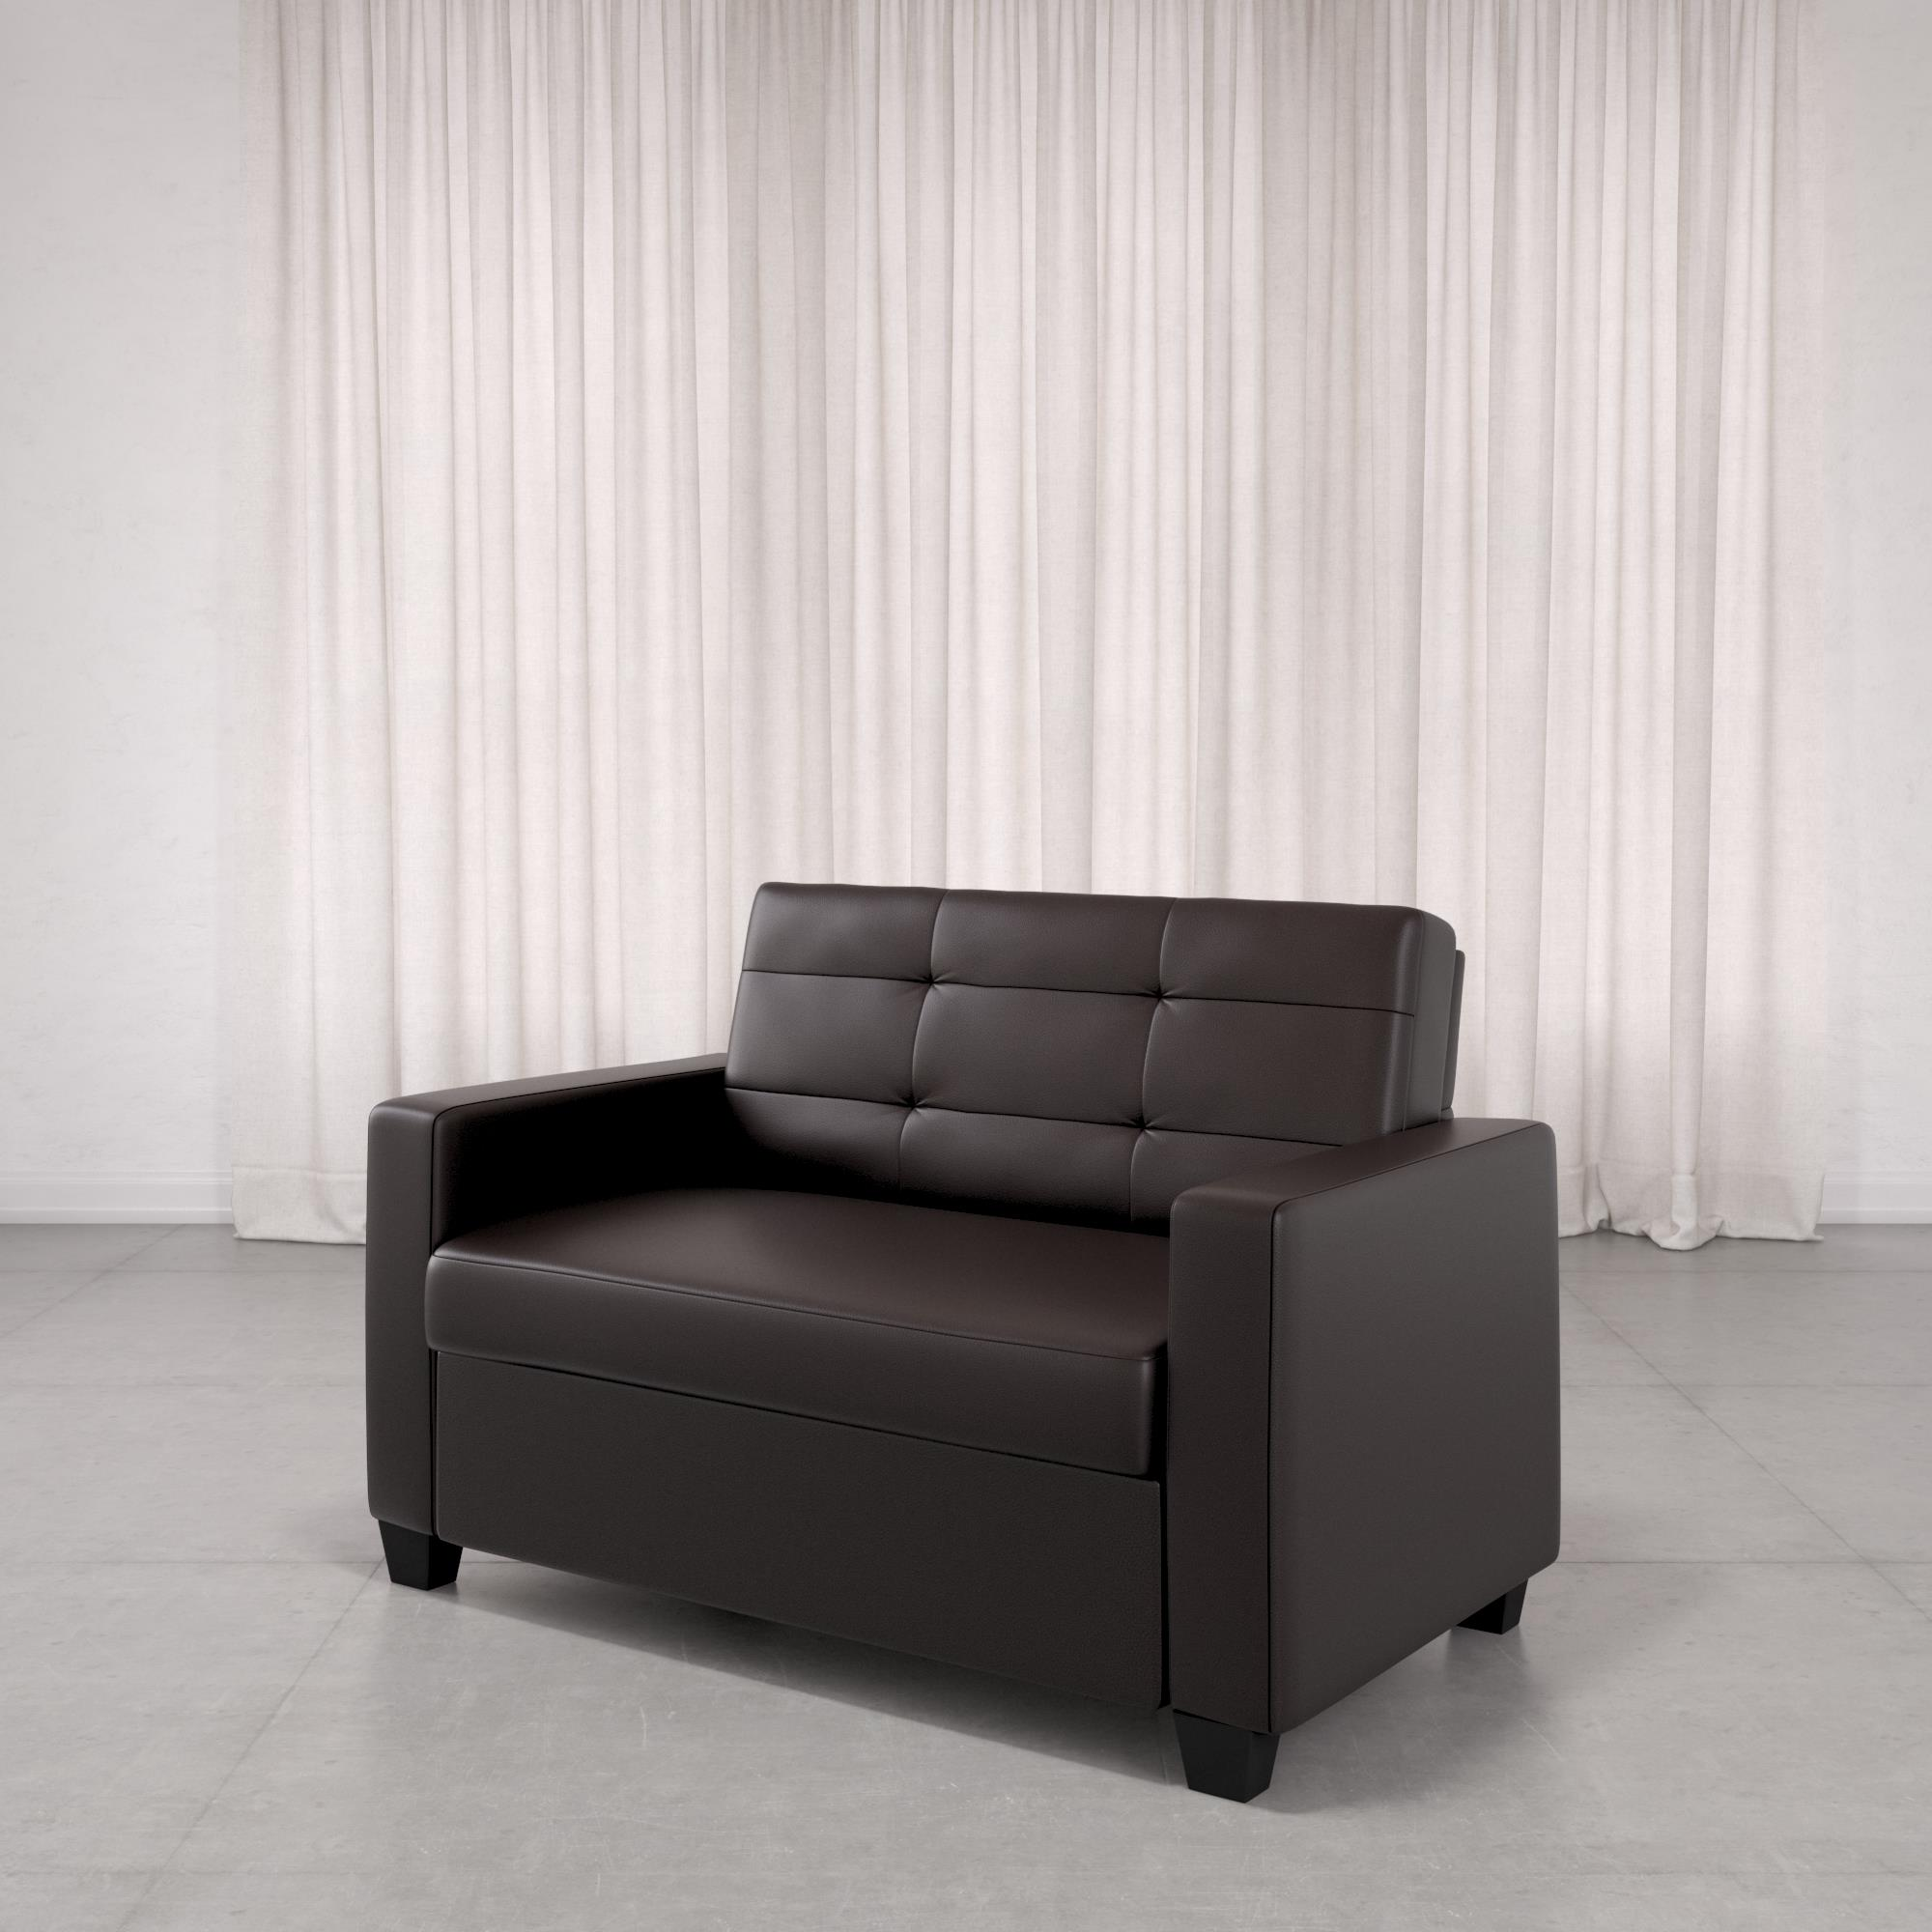 Mainstays Loveseat Sleeper Sofa Twin Chocolate Faux Leather Walmart Com Walmart Com